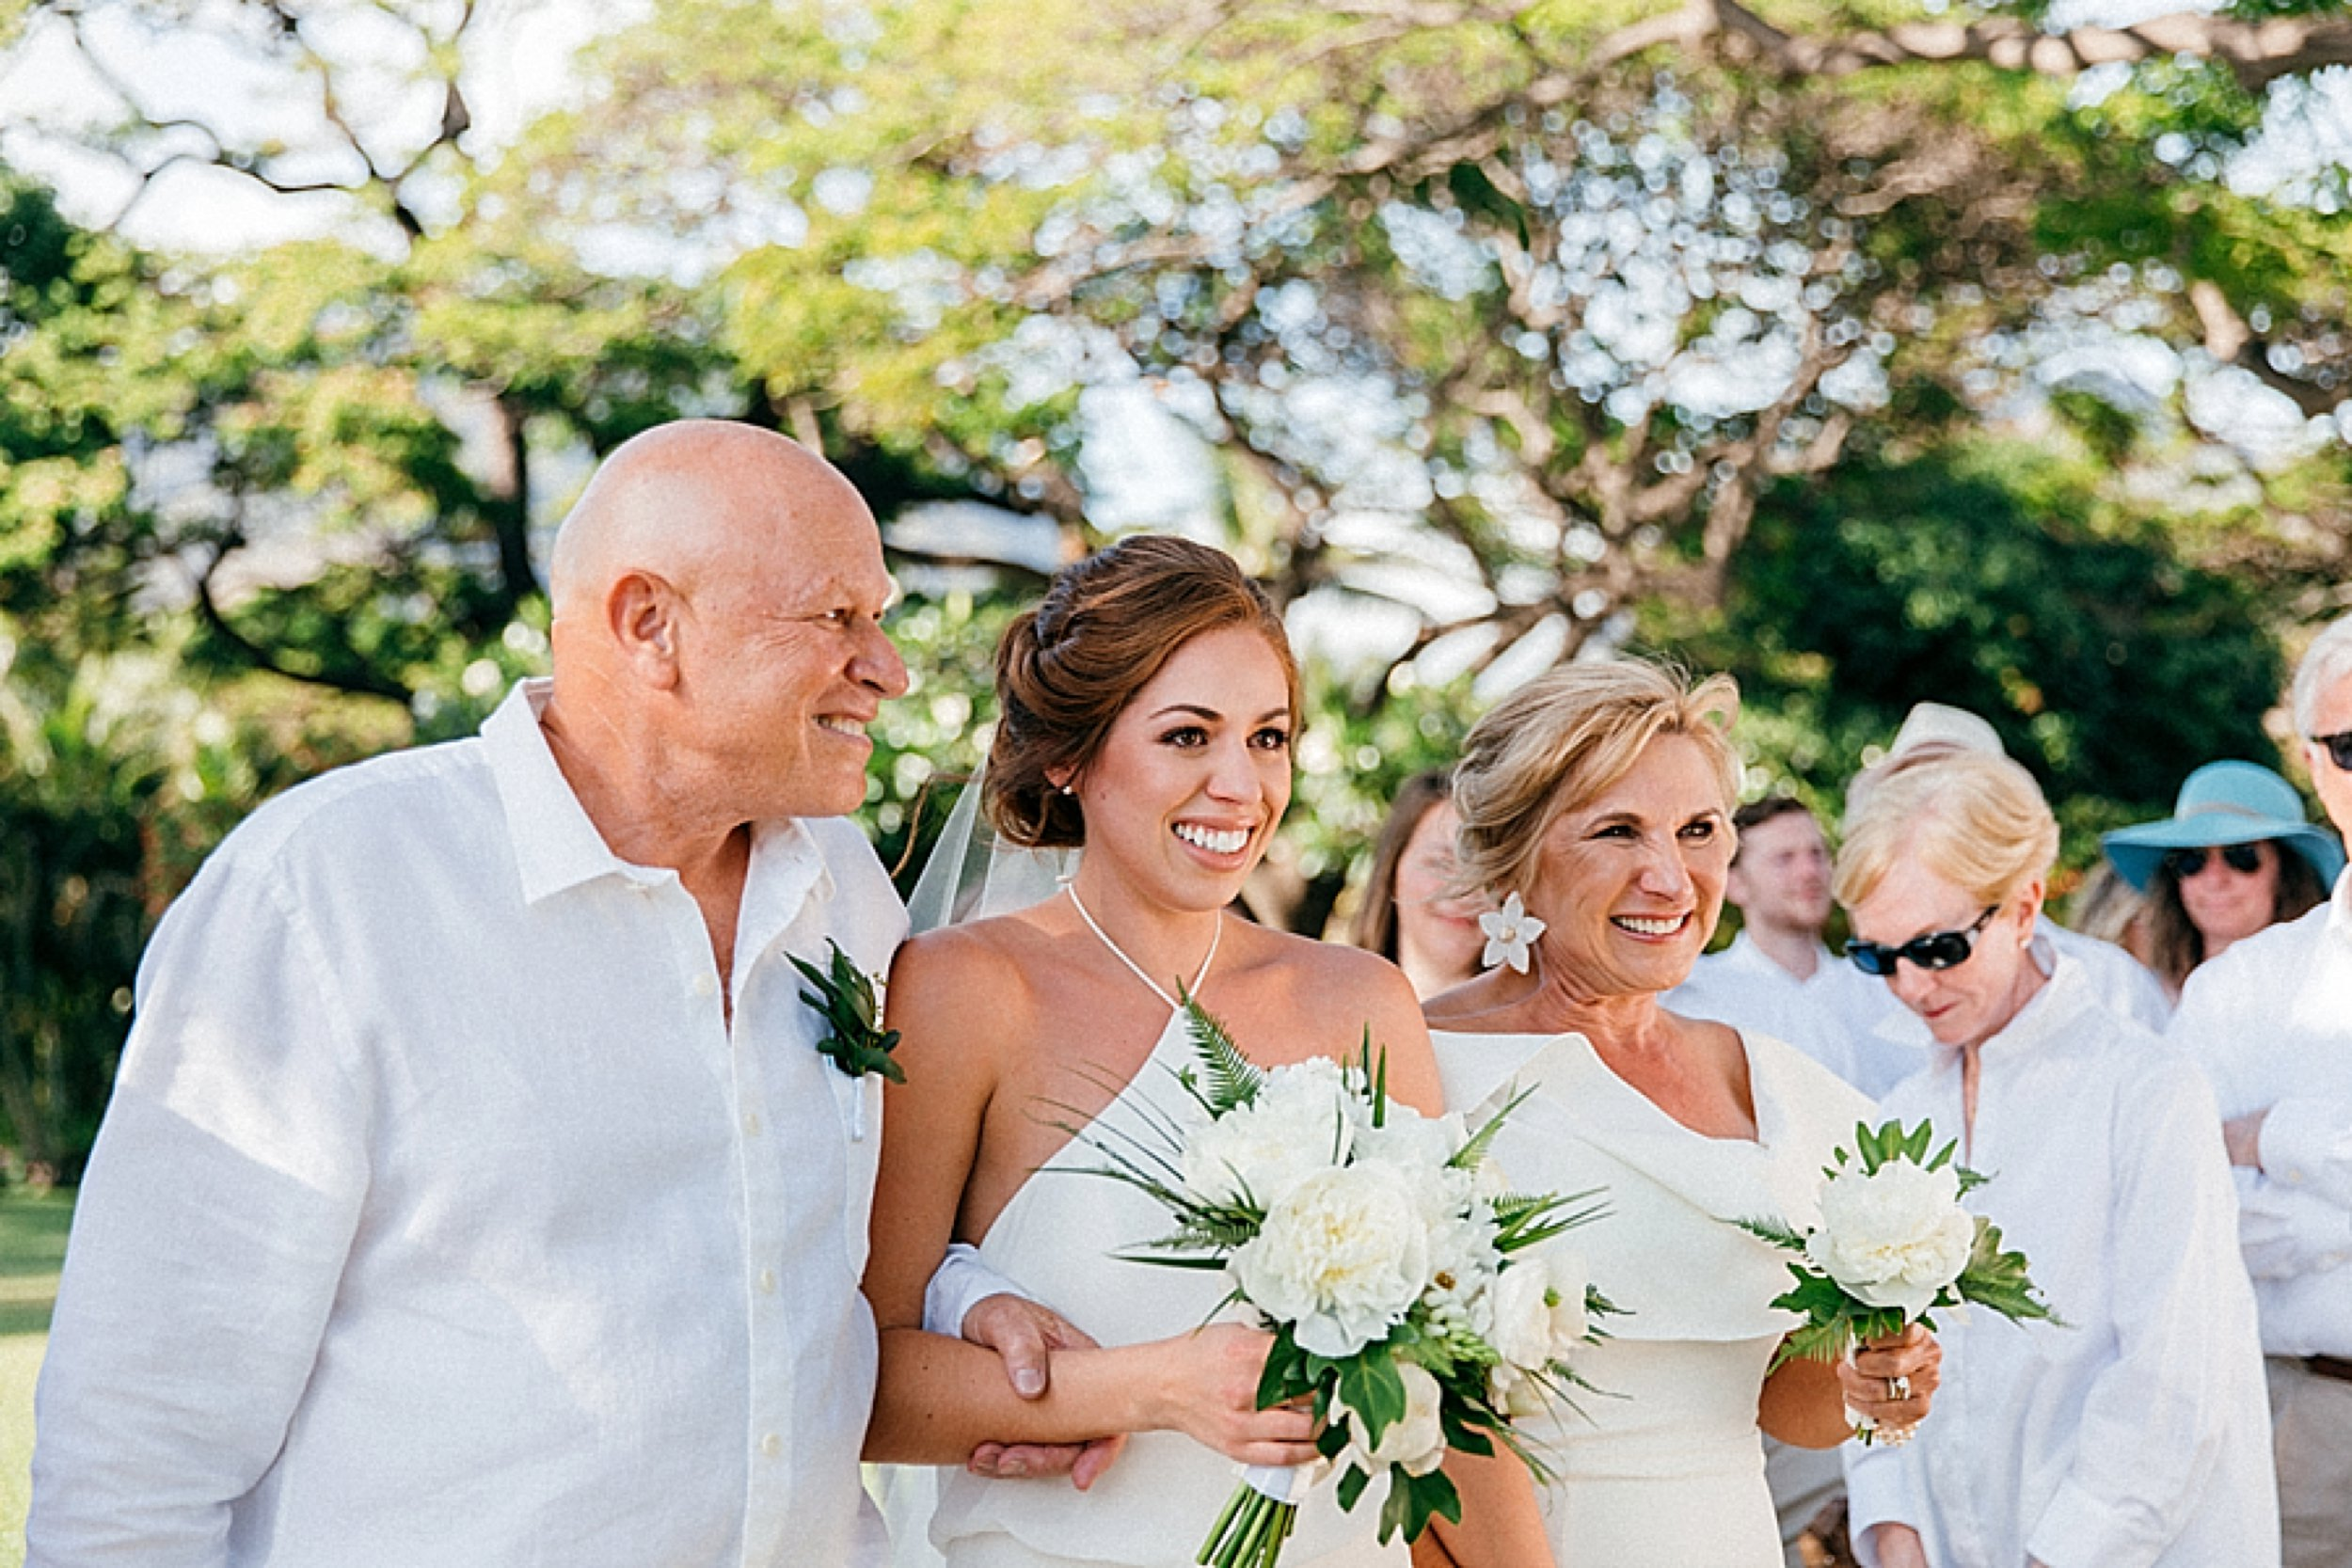 maui-wedding-at-olowalu-plantation-house_0048.jpg